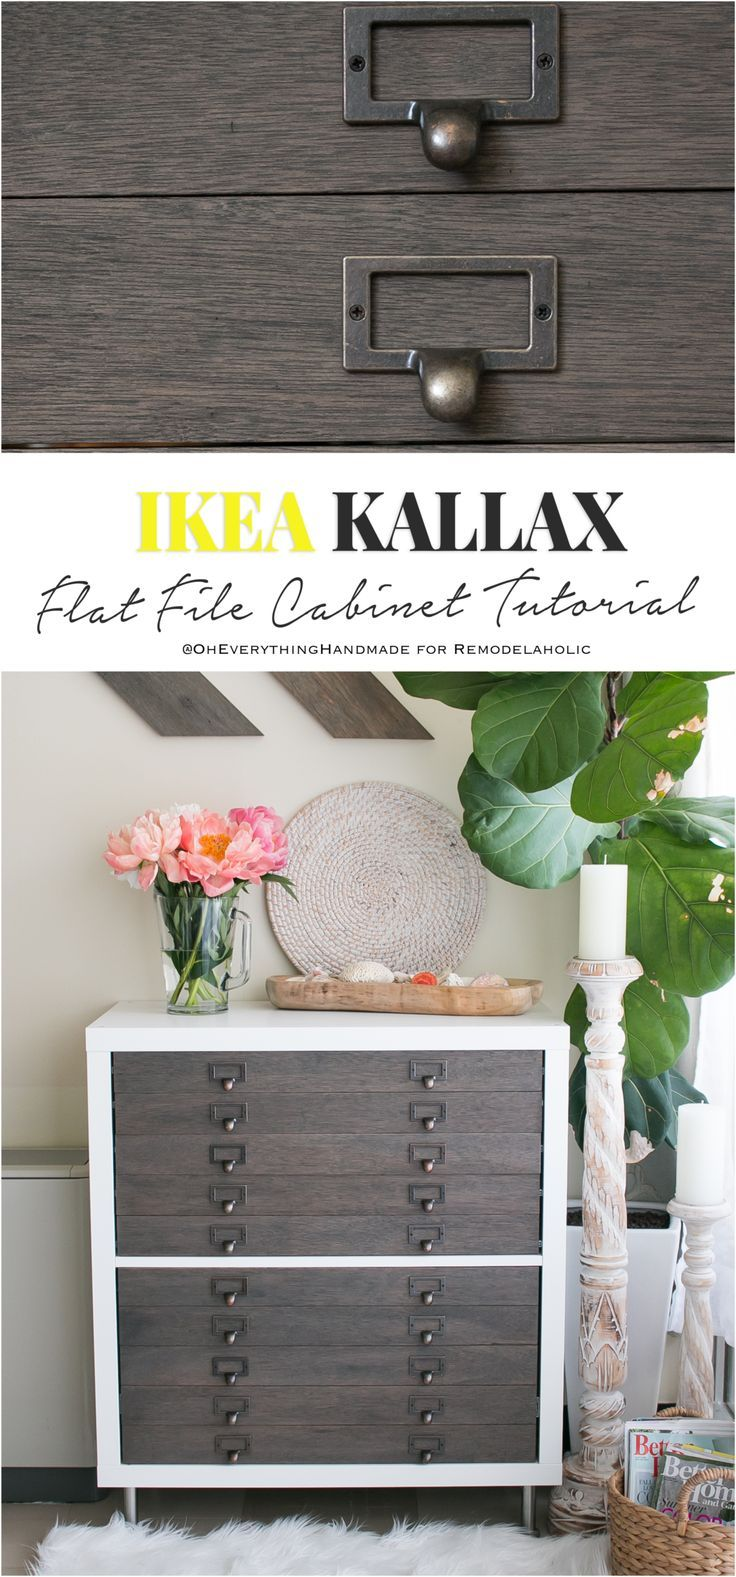 Ikea Kallax Flat File Cabinet Hack Via Oh Everything Ha  # Muebles Cebollero